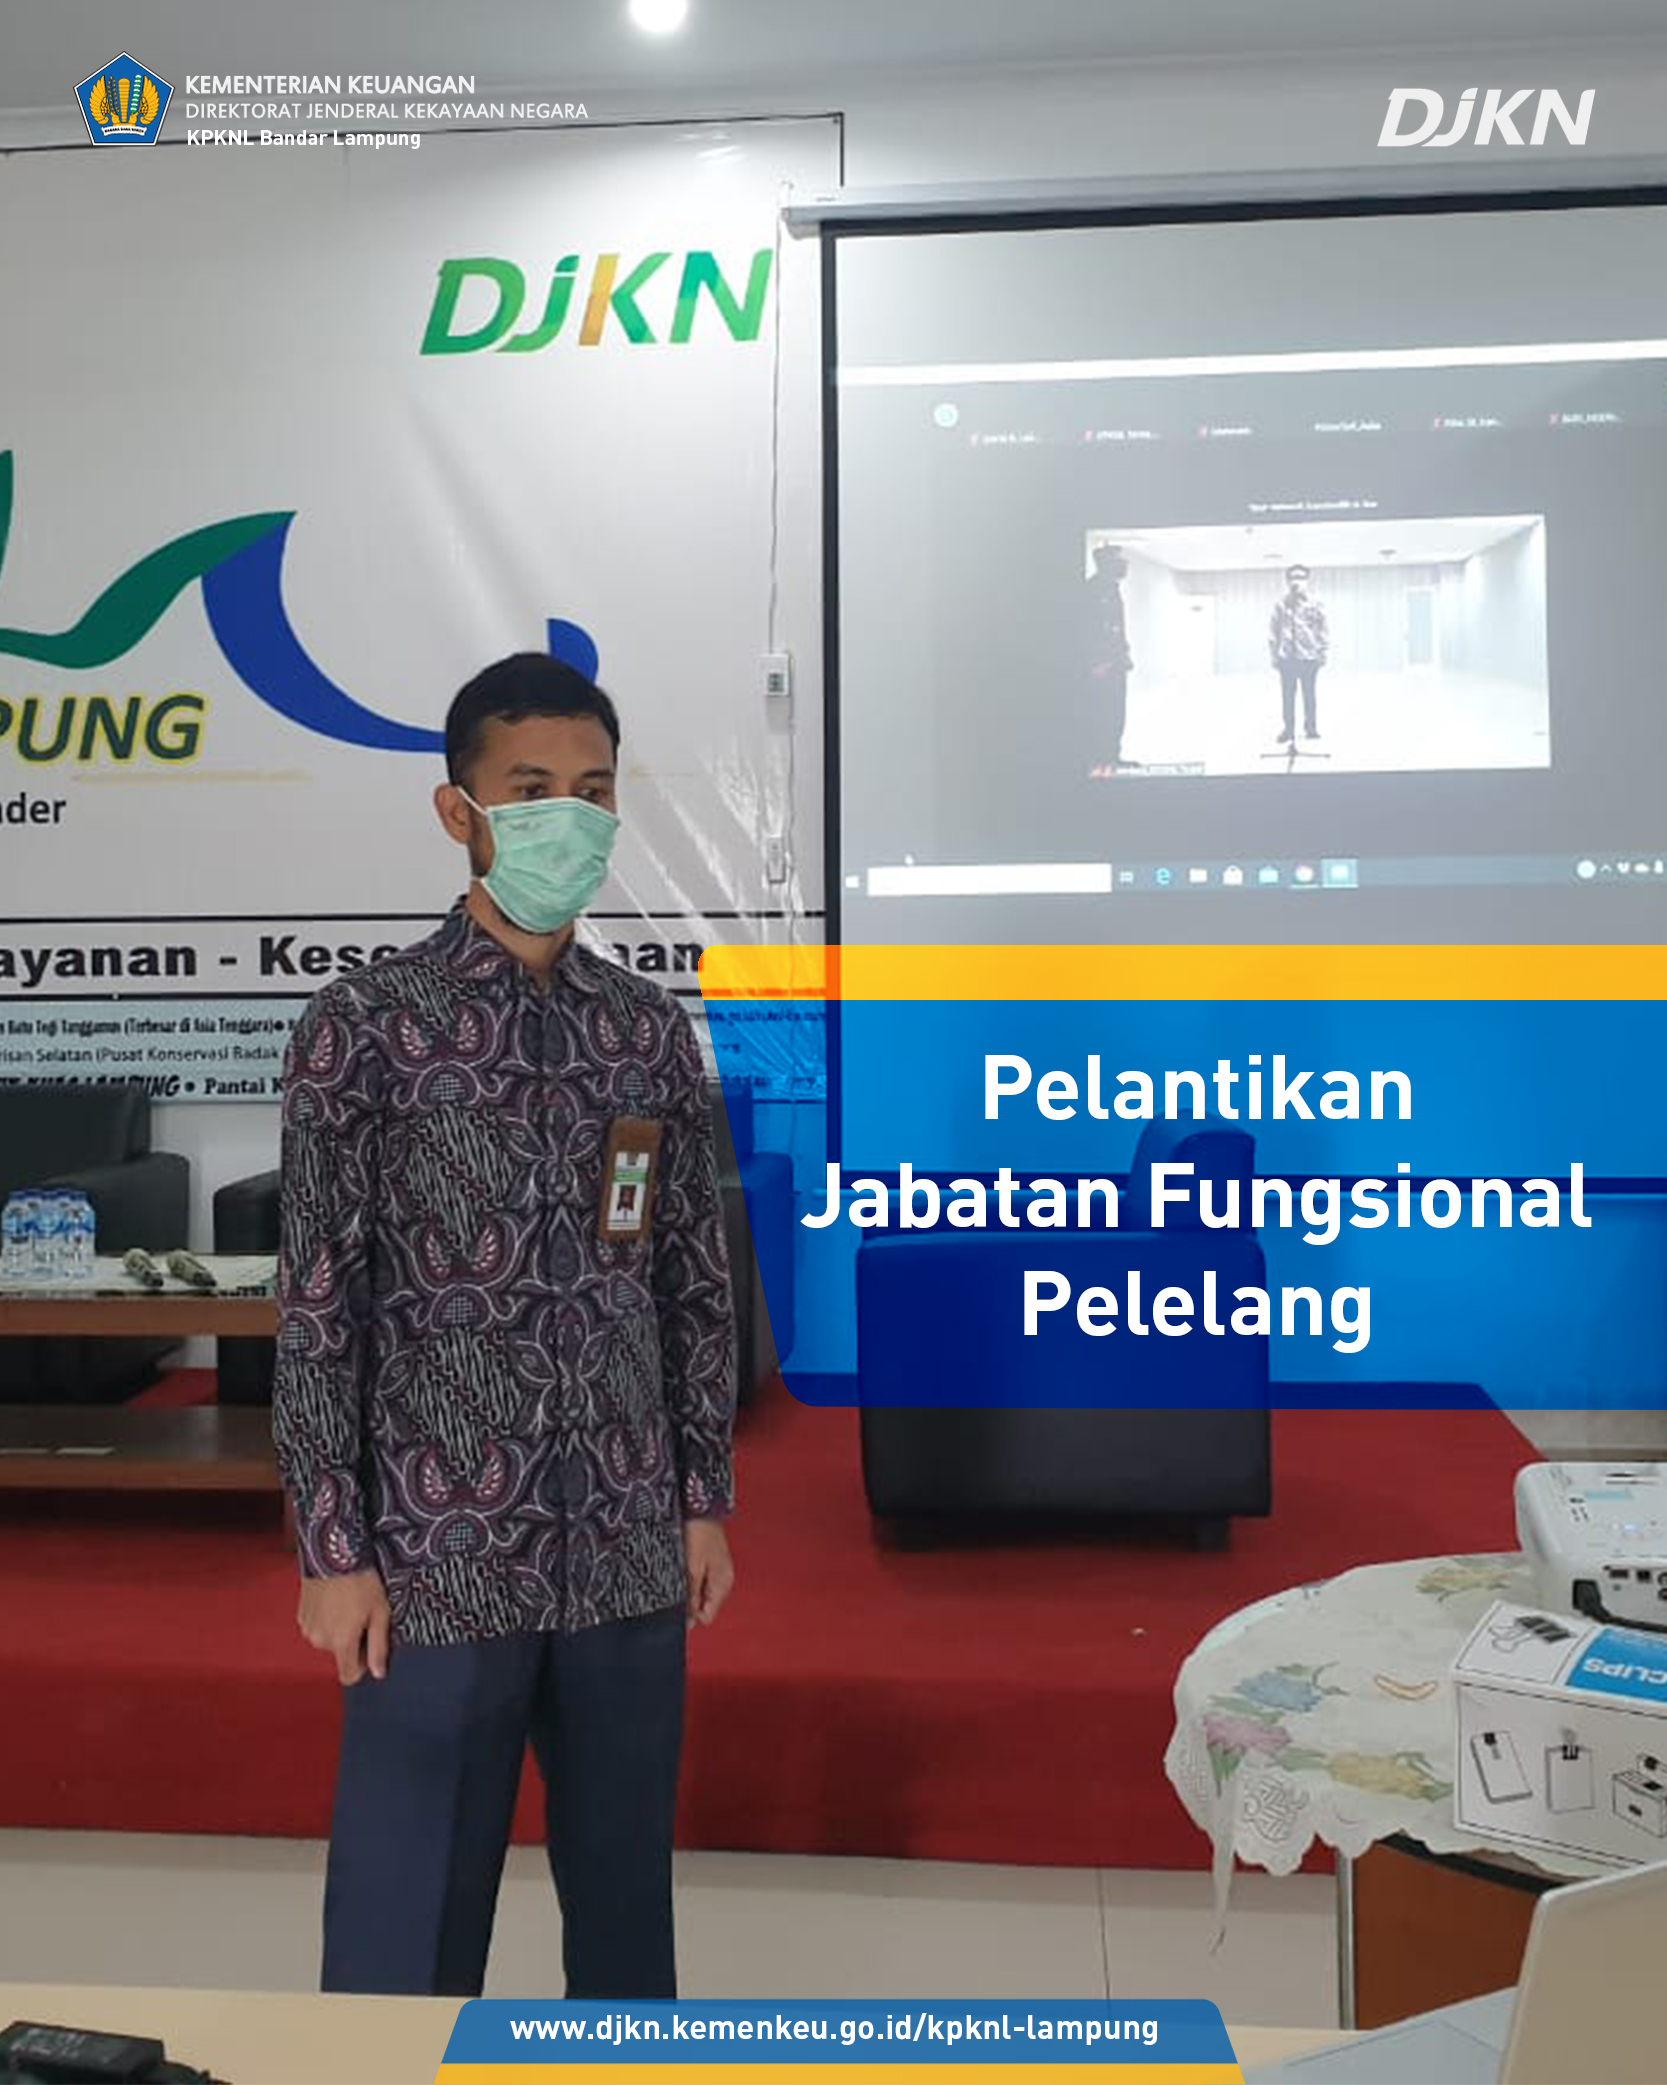 Pelantikan Jafung Pelelang KPKNL Bandar Lampung